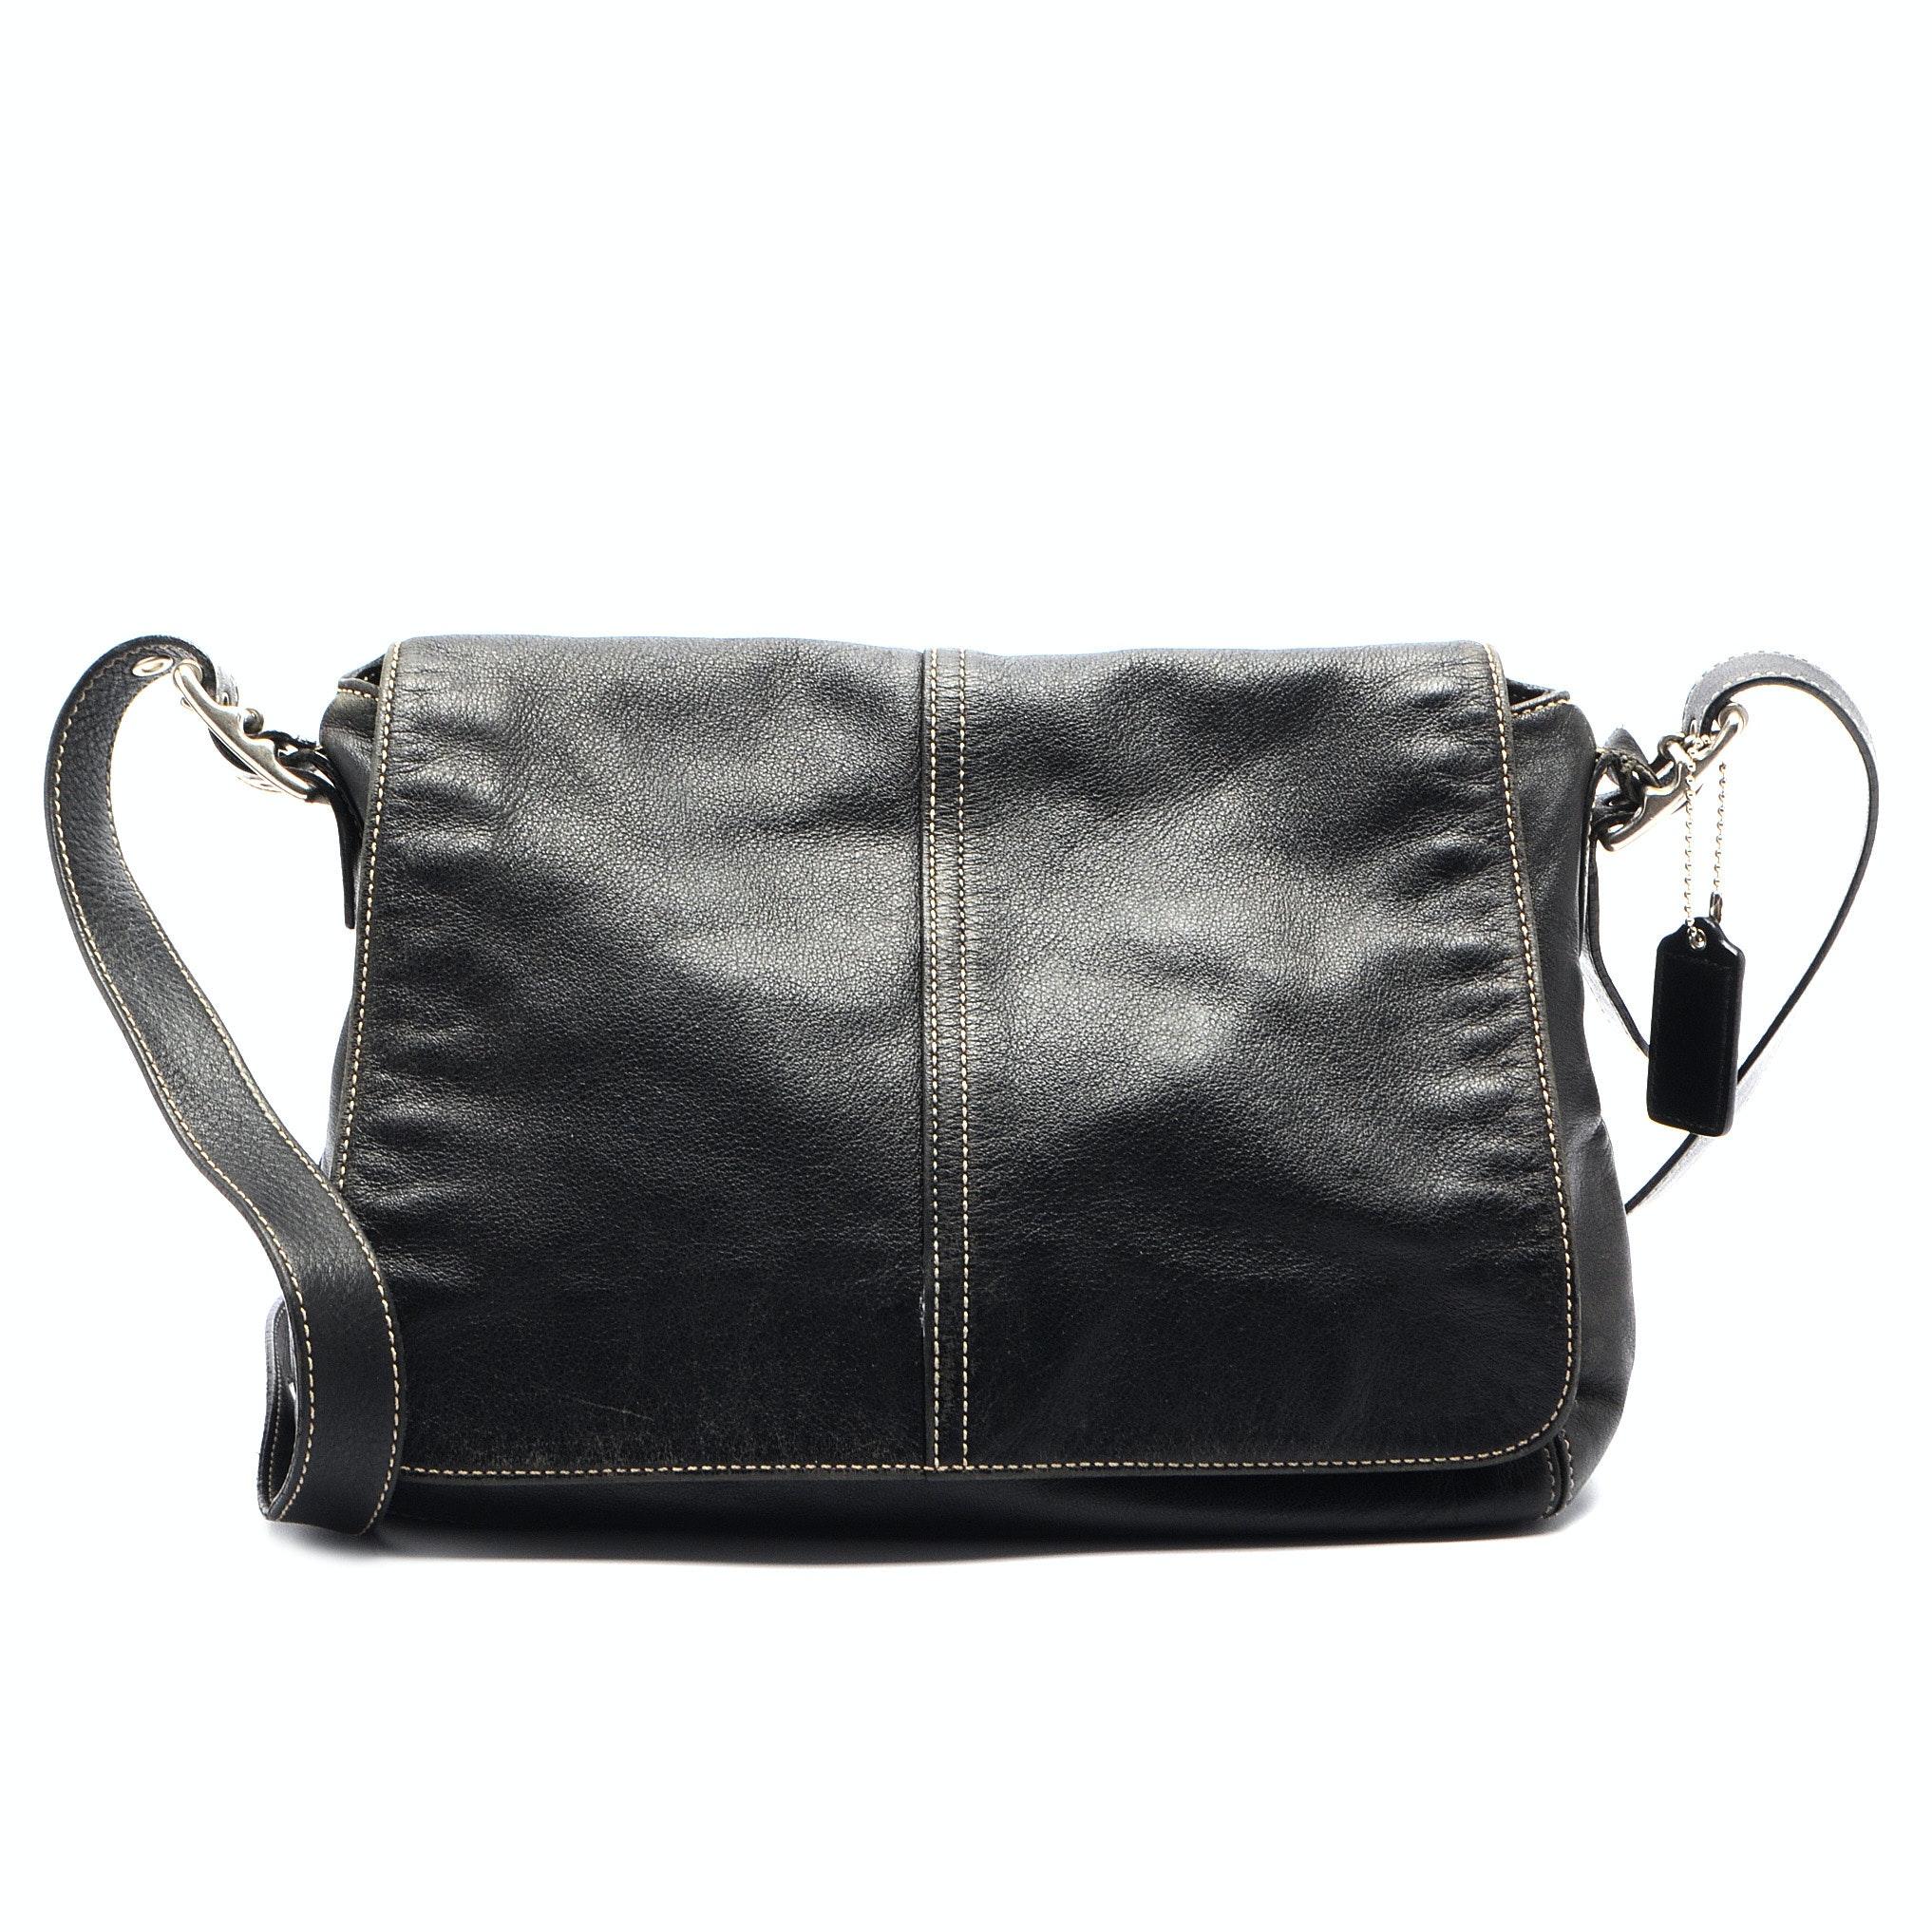 Coach Hampton's Flap Handbag